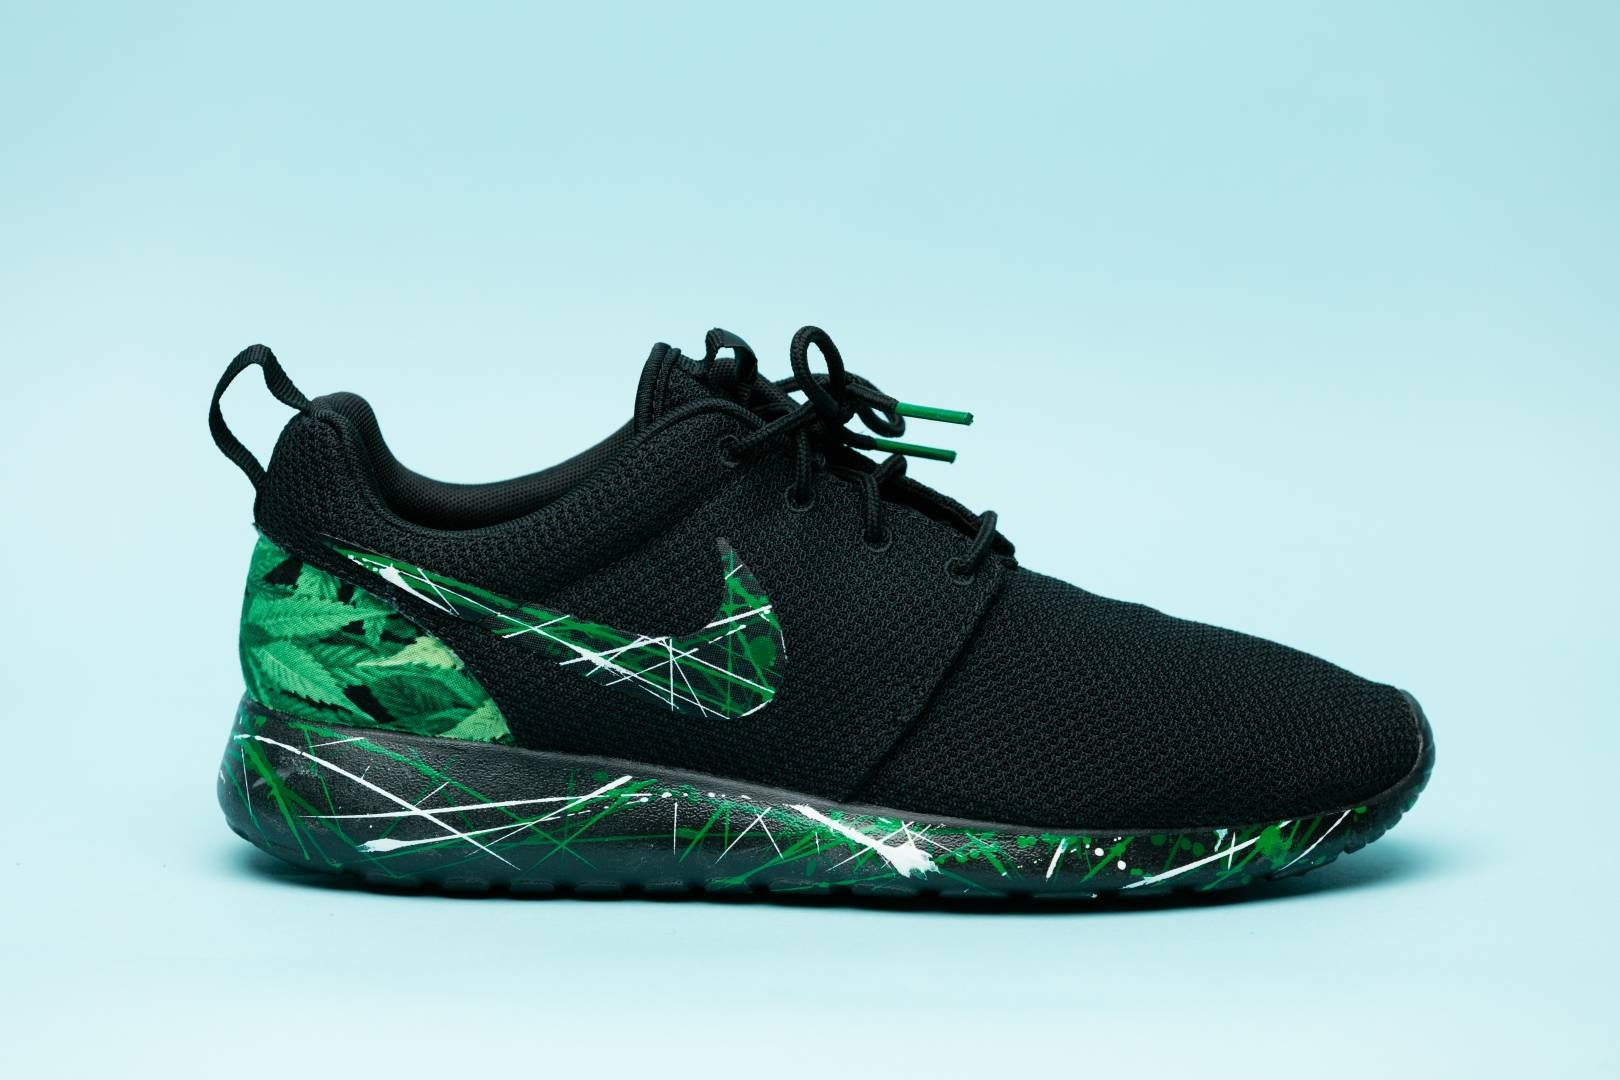 Chaussures de sport Nike Ganja vert noir kush sur fait main sur kush mesure  tous les ... 8b86aa618b99